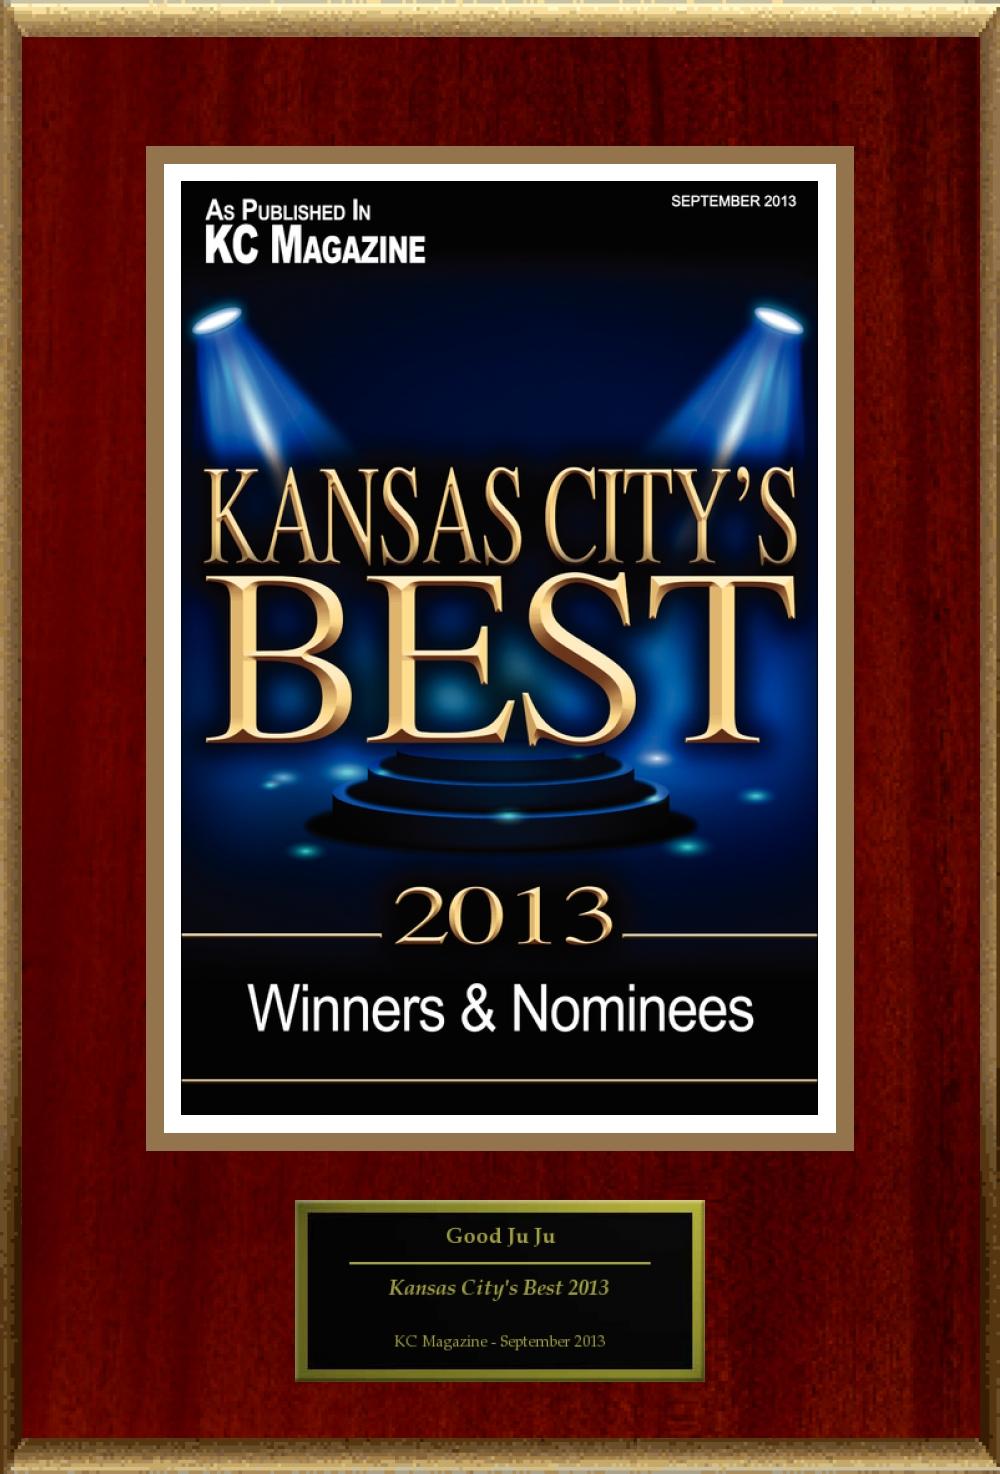 KC Magazine City's Best Award 2013